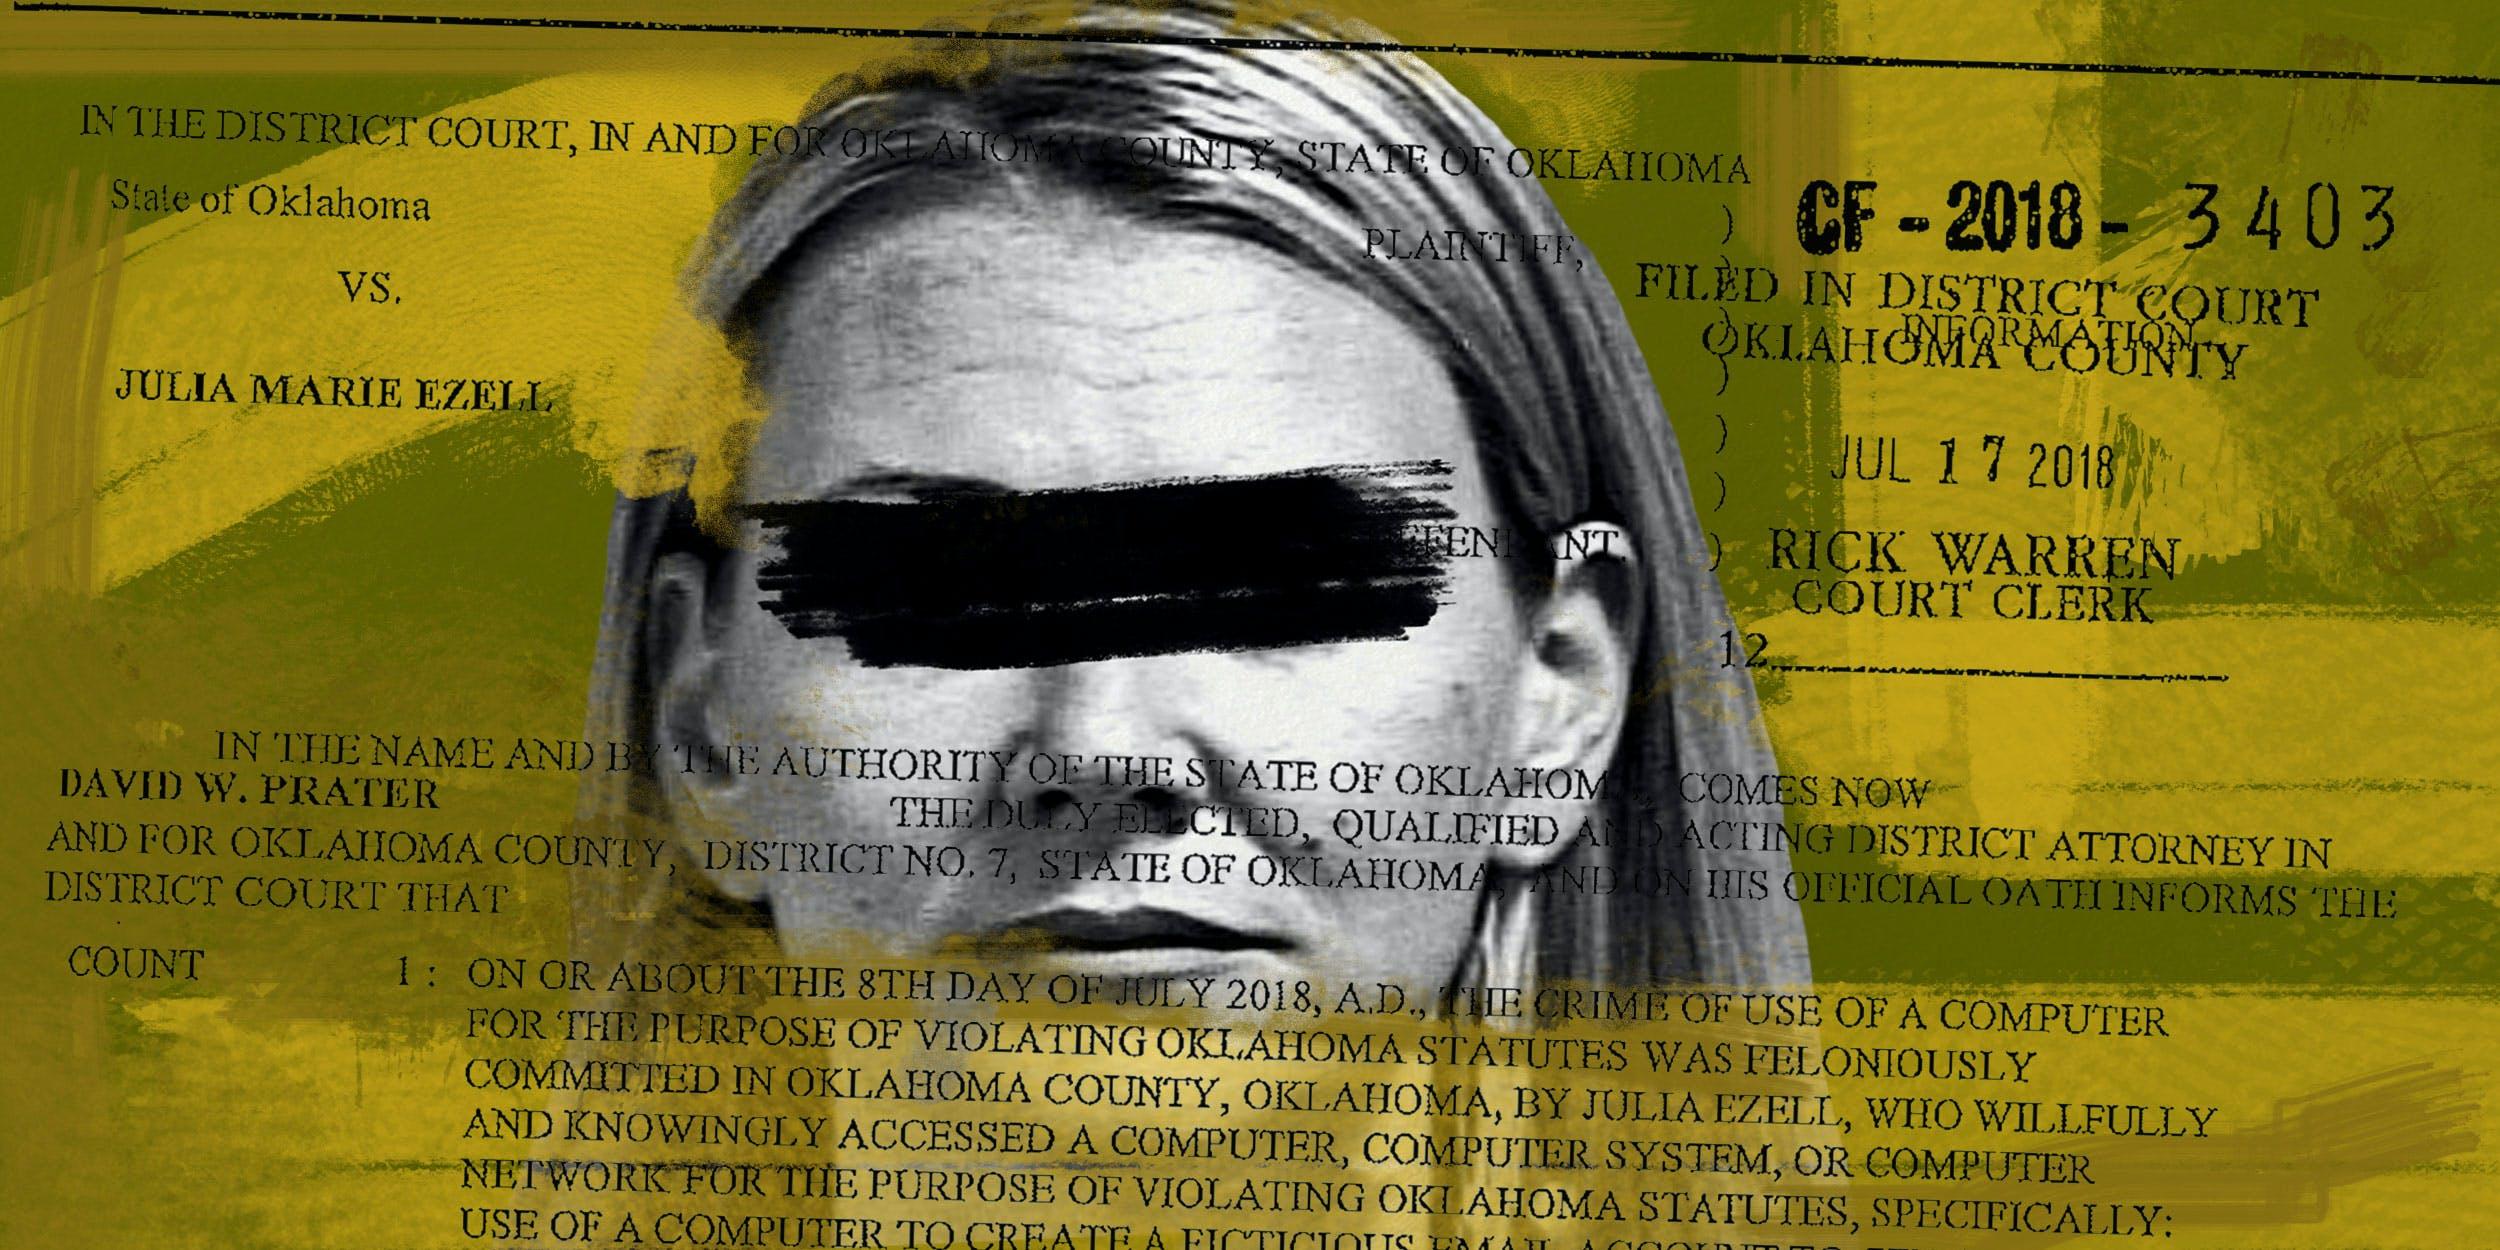 Oklahoma Gov't Lawyer, Julie Ezell, Resigns After Sending Fake Threats Over Medical Marijuana